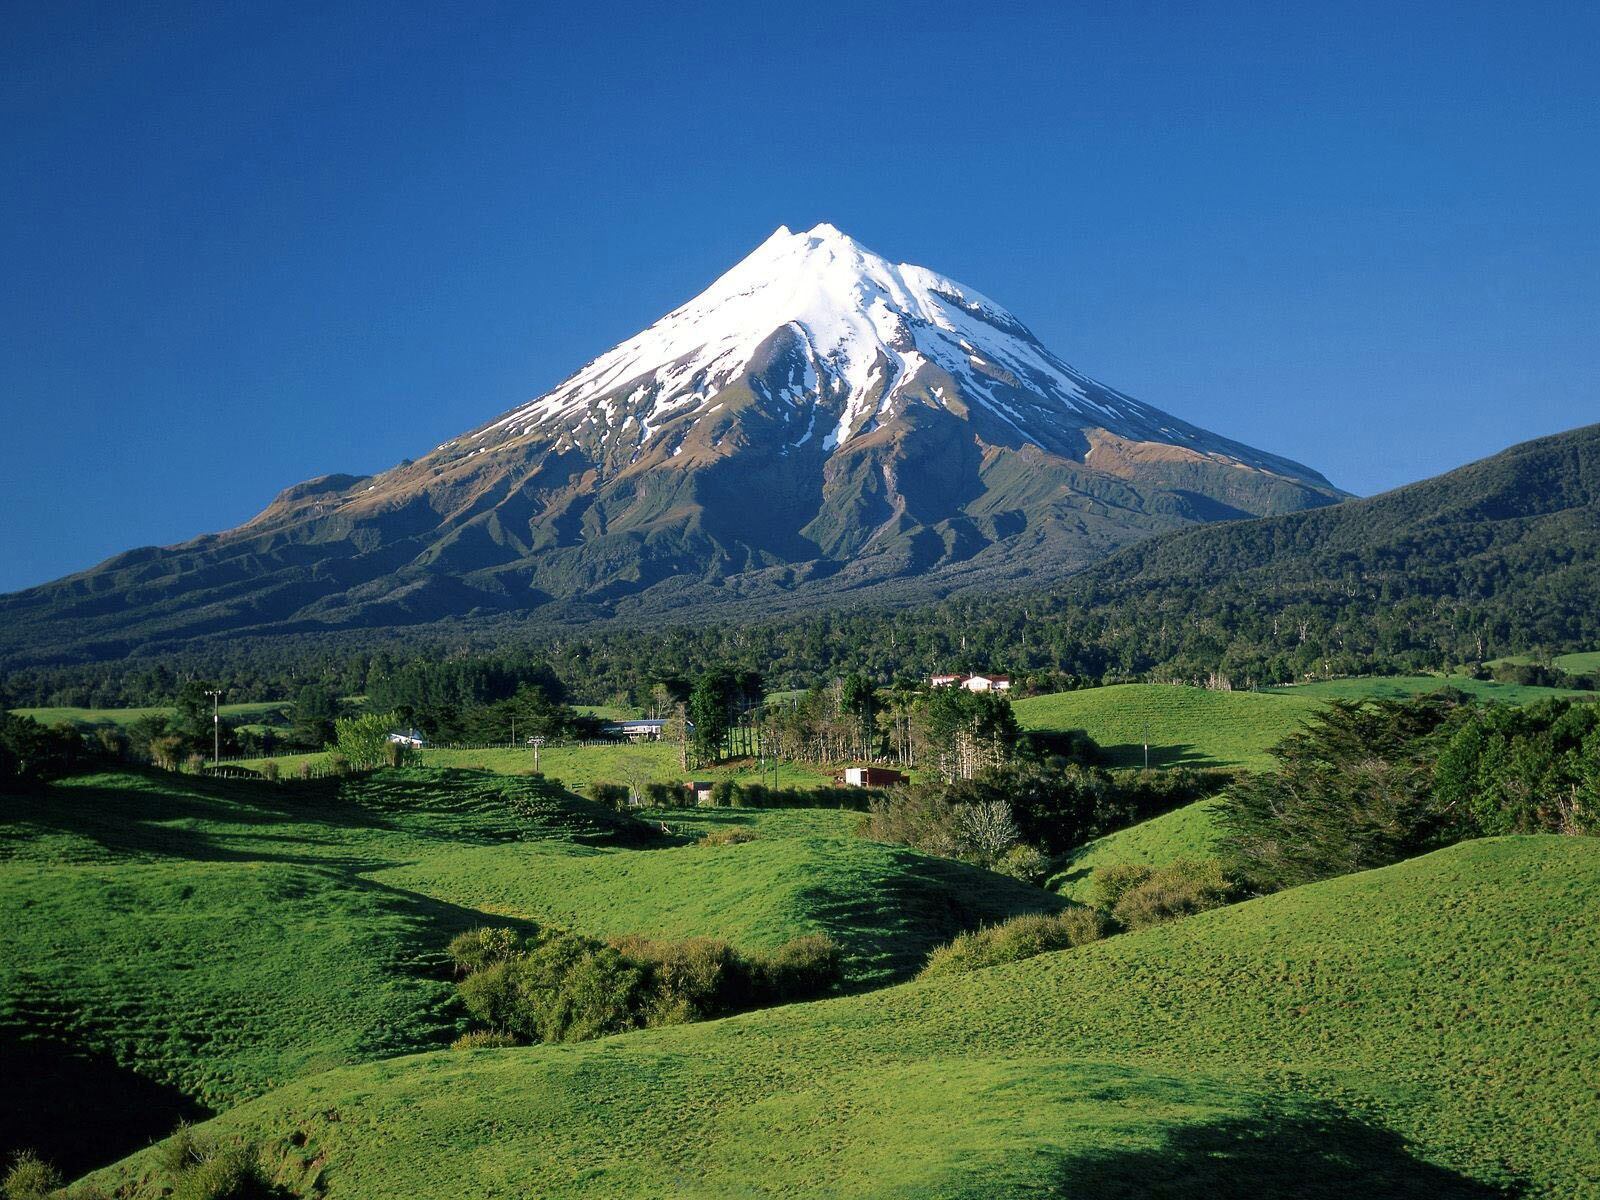 Mountain Pictures Mountains